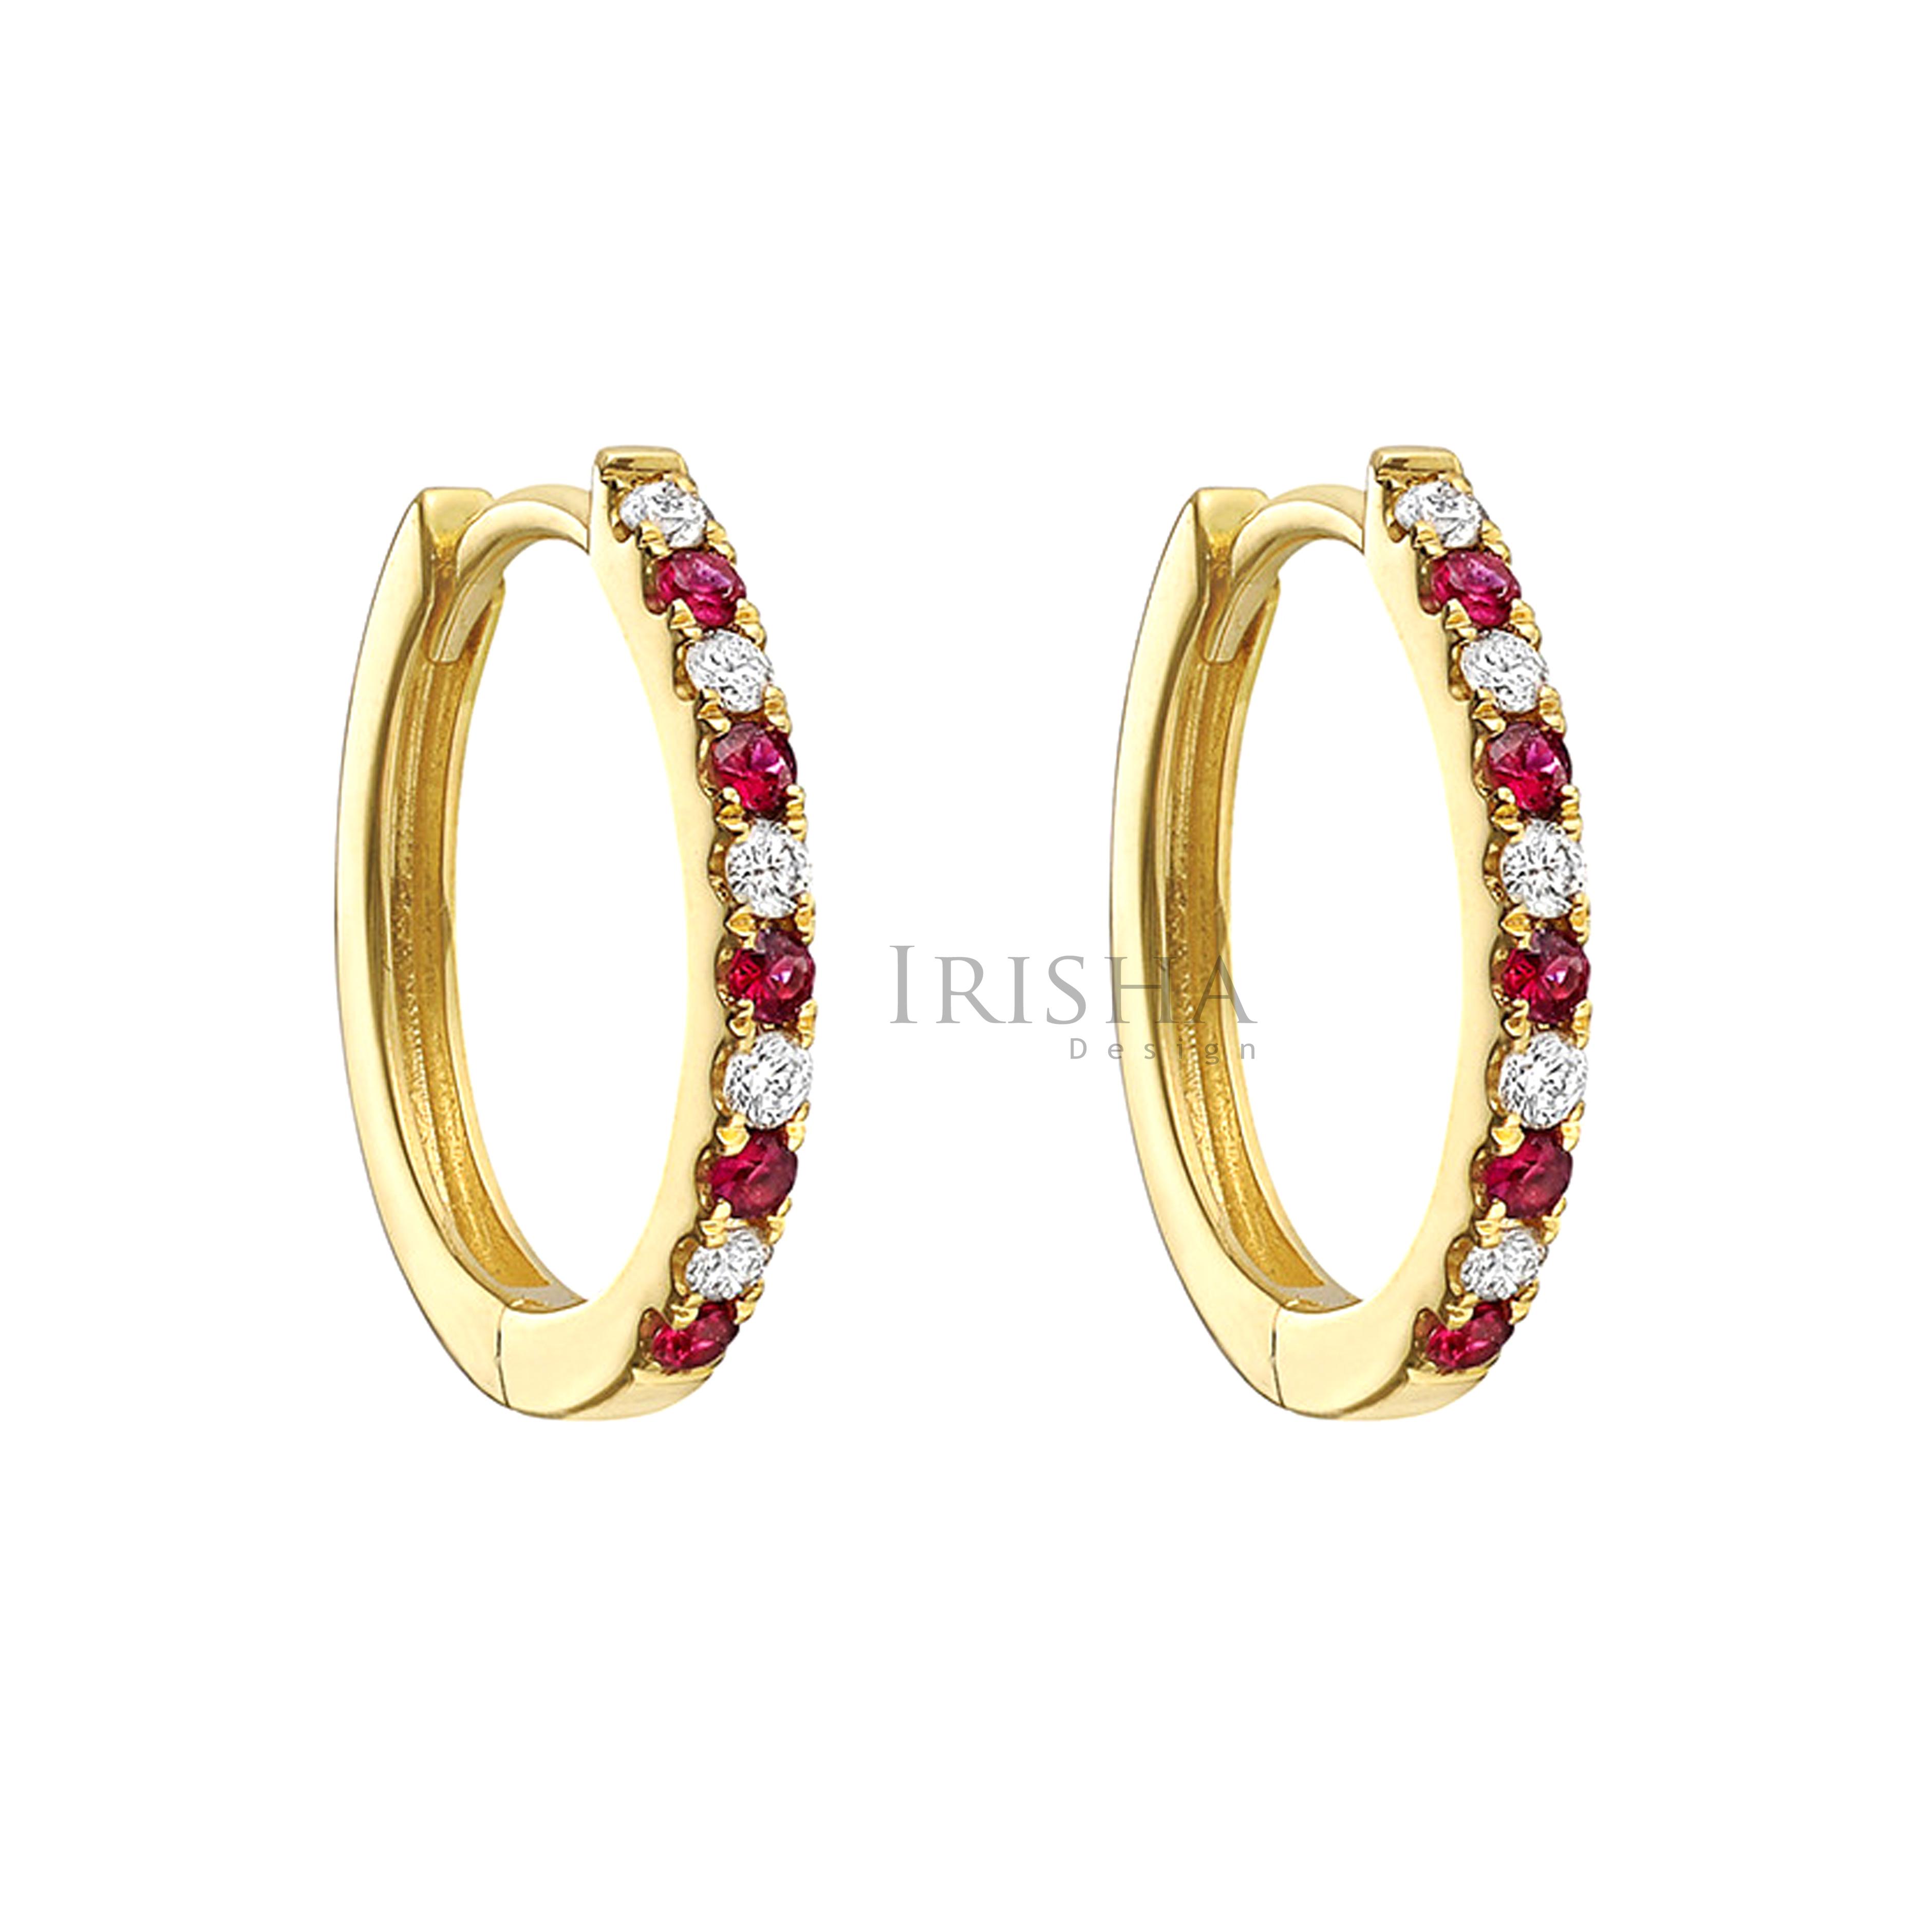 14K Gold Genuine Diamond And Ruby Gemstone Hoop Earrings Fine Jewelry